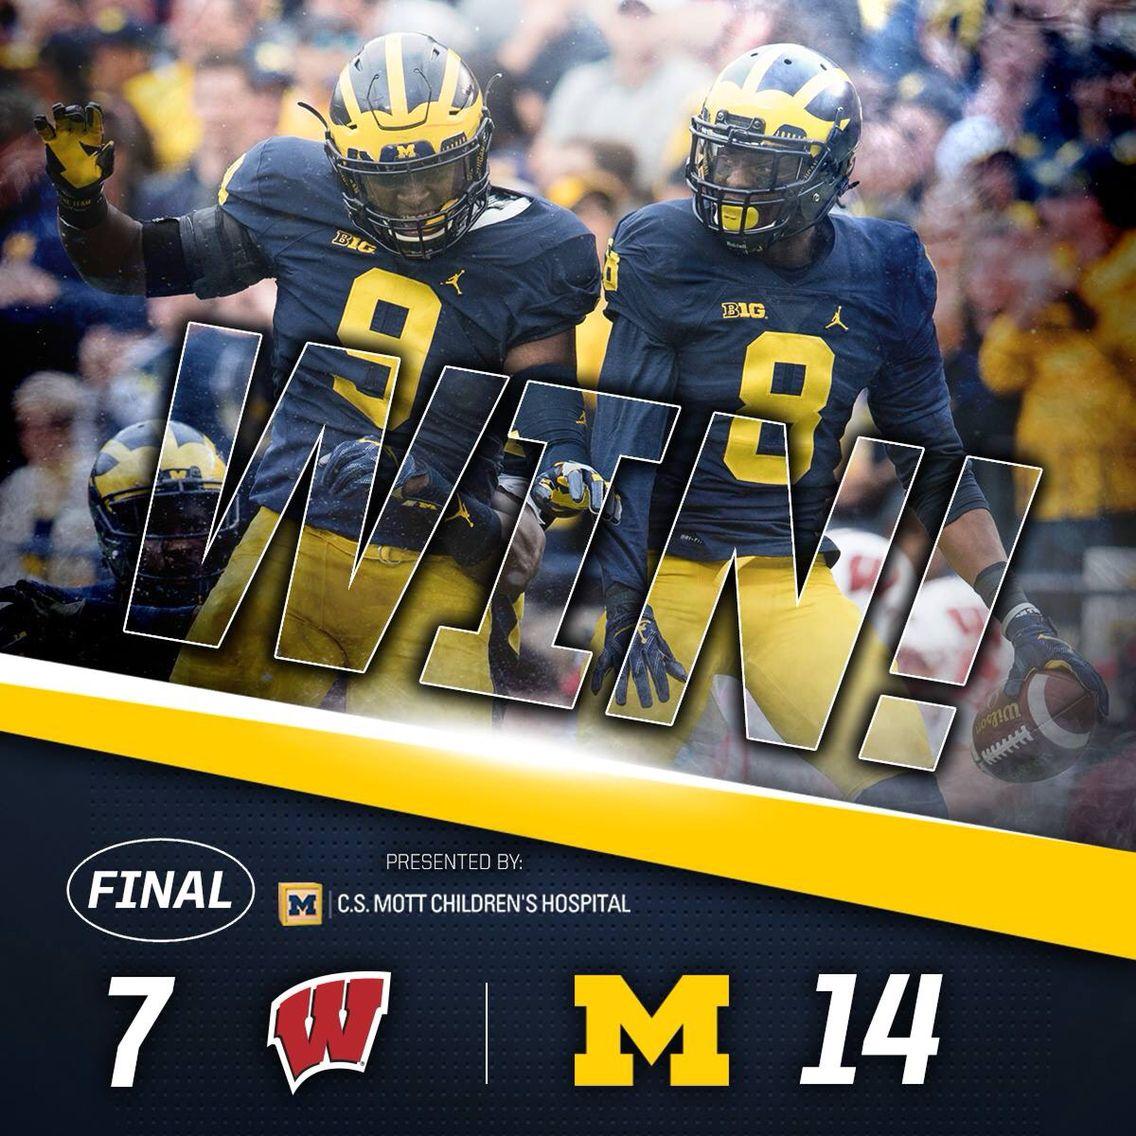 Michigan beats #8 Wisconsin! Go Blue!